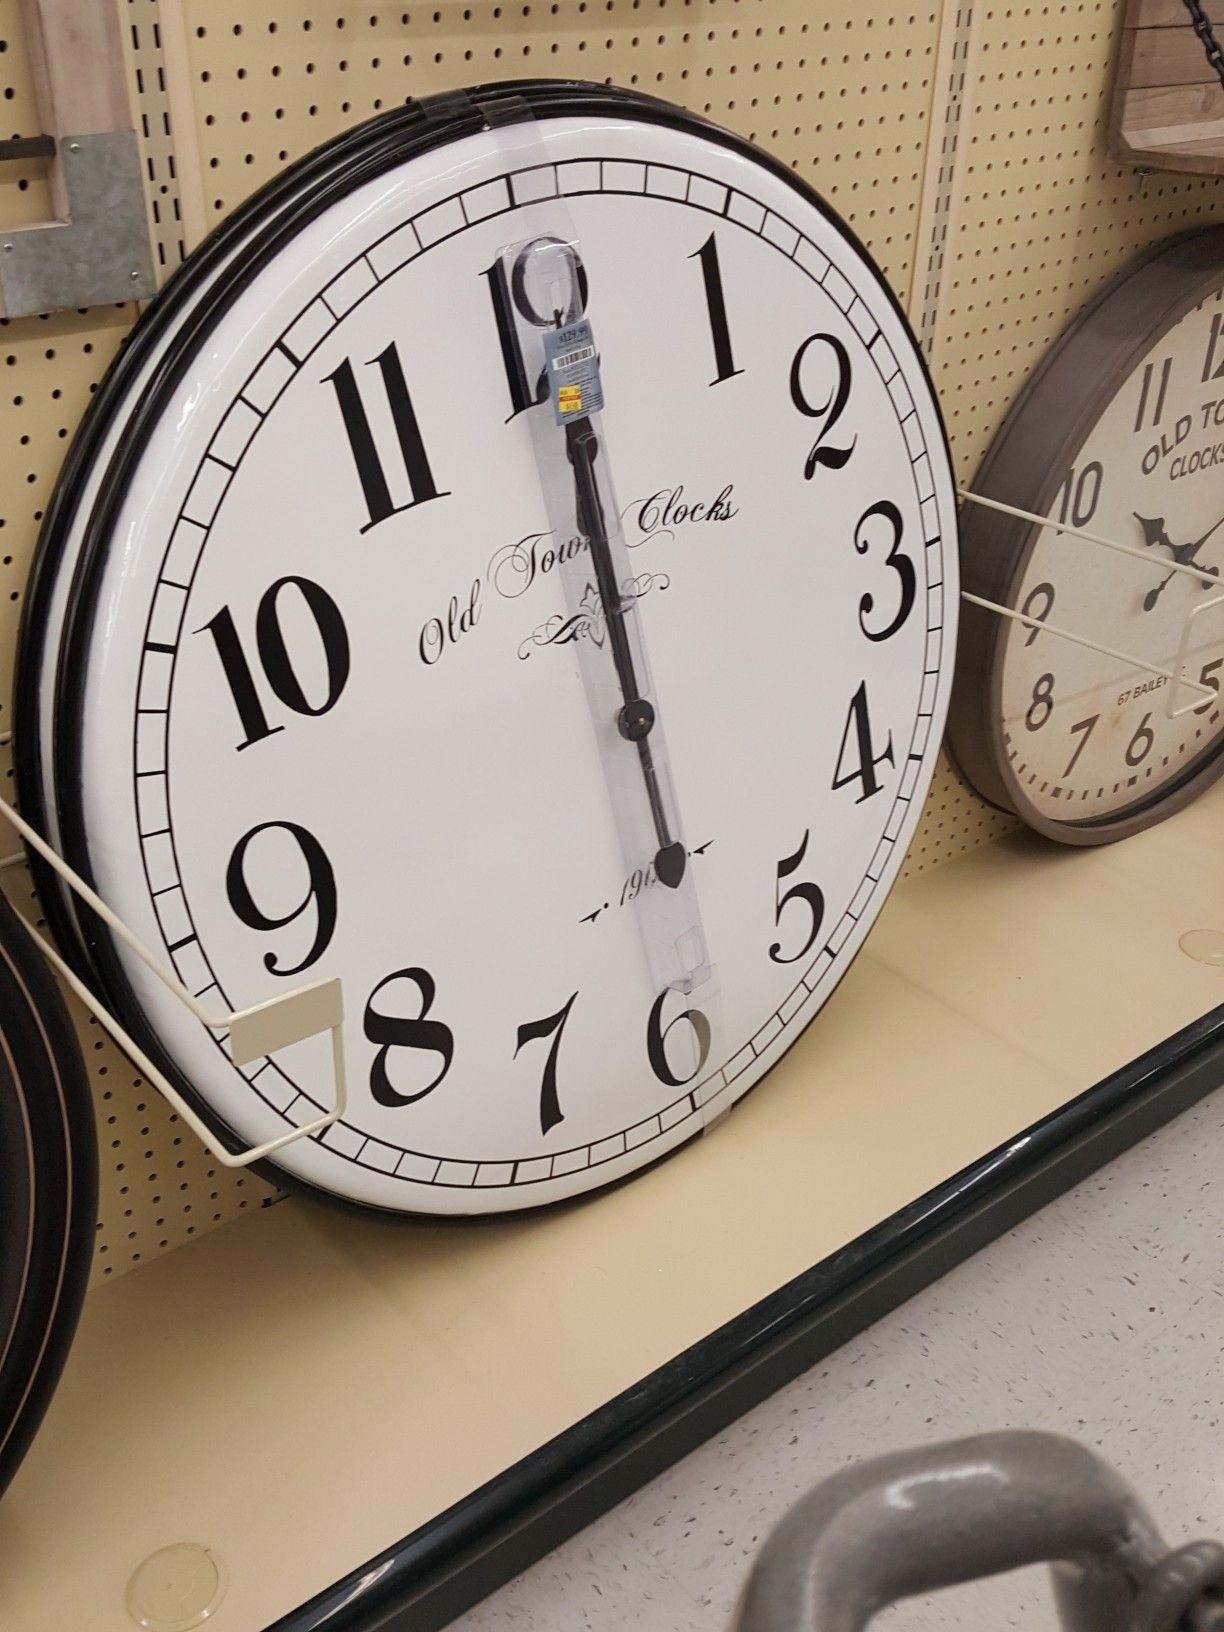 Huge enamel clock from hobby lobby could be nice in